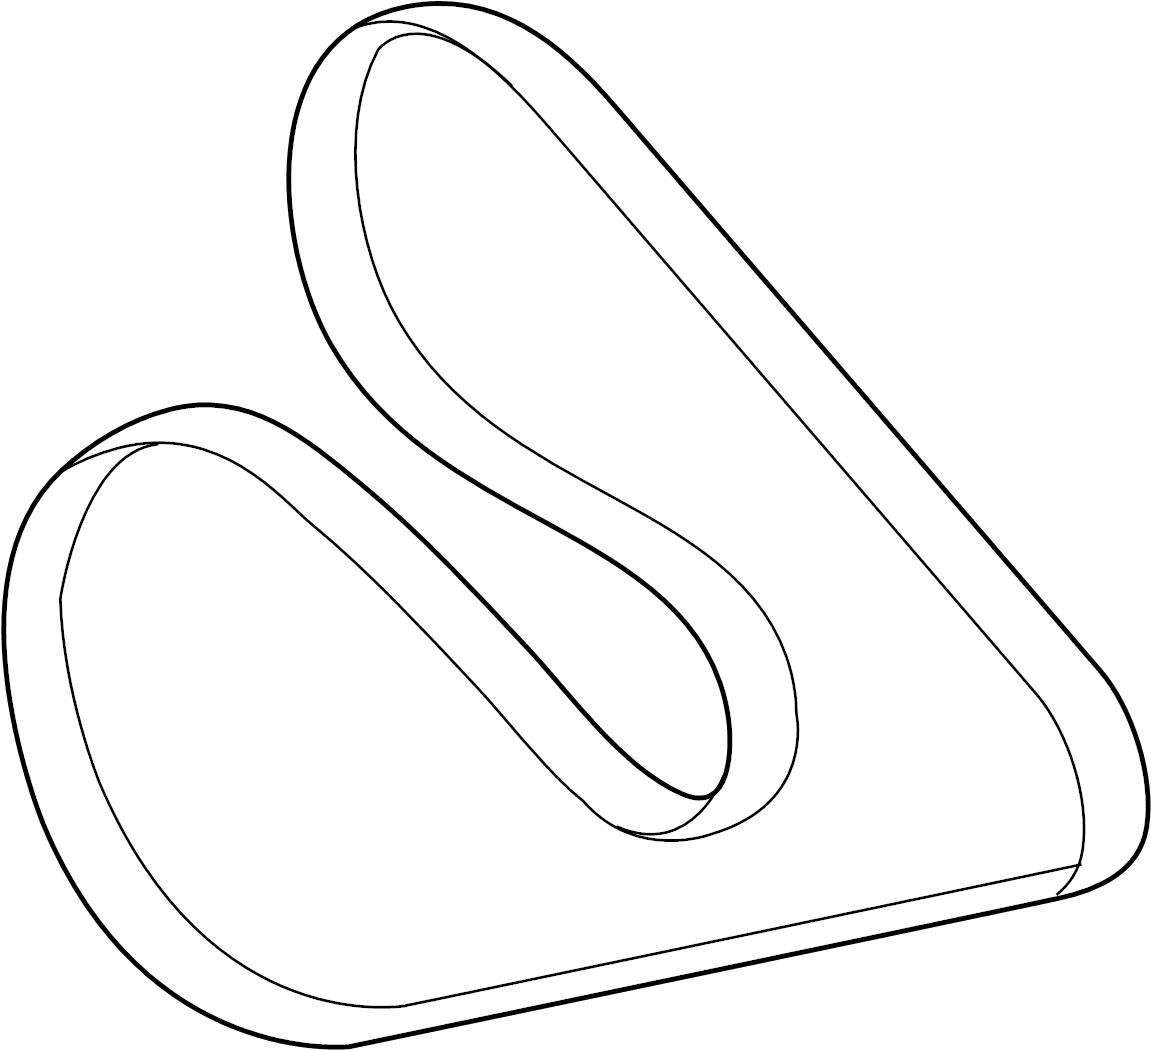 tags: #2004 hyundai sonata serpentine belt diagram#2006 gmc sierra serpentine  belt diagram#2007 chevy impala belt routing#2004 chevy impala serpentine